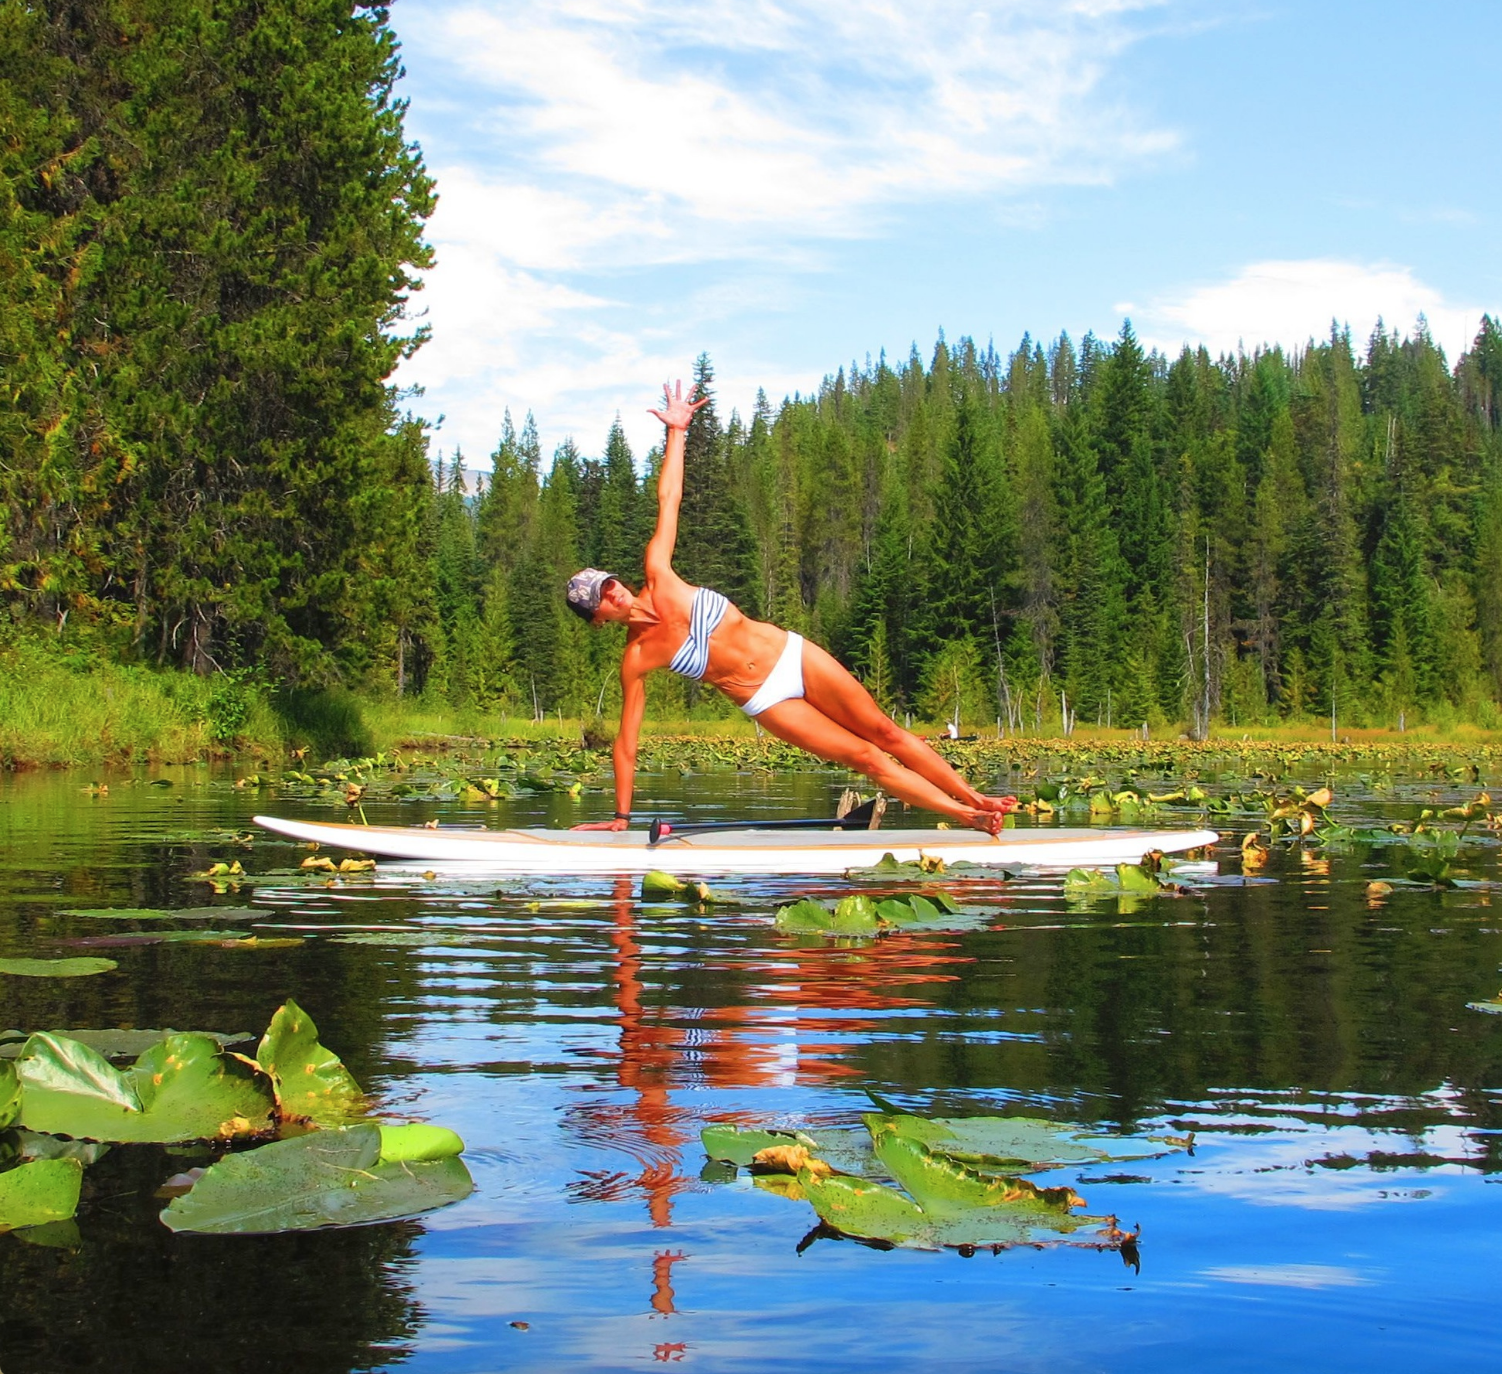 Paddle board yoga 2